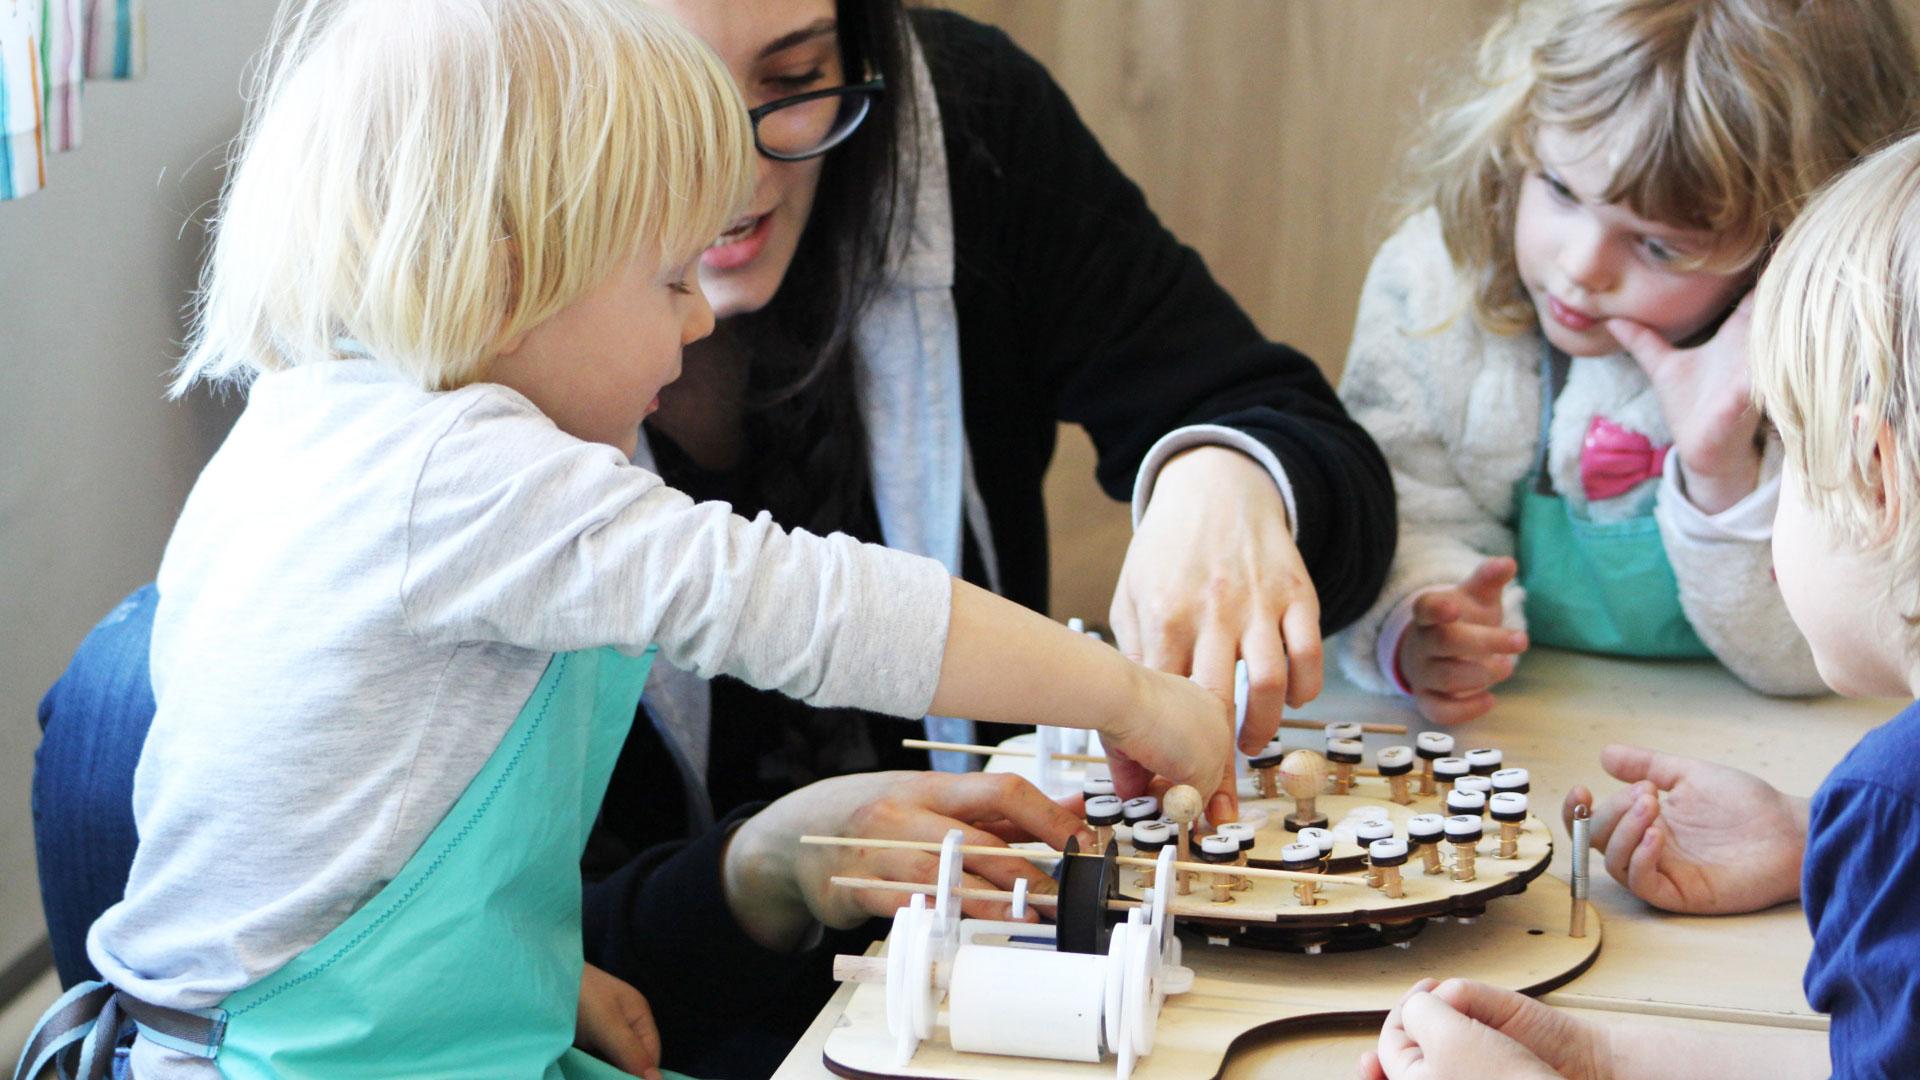 curs extrascolar de bricolaj pentru copii gradinita atelier activitati eematico